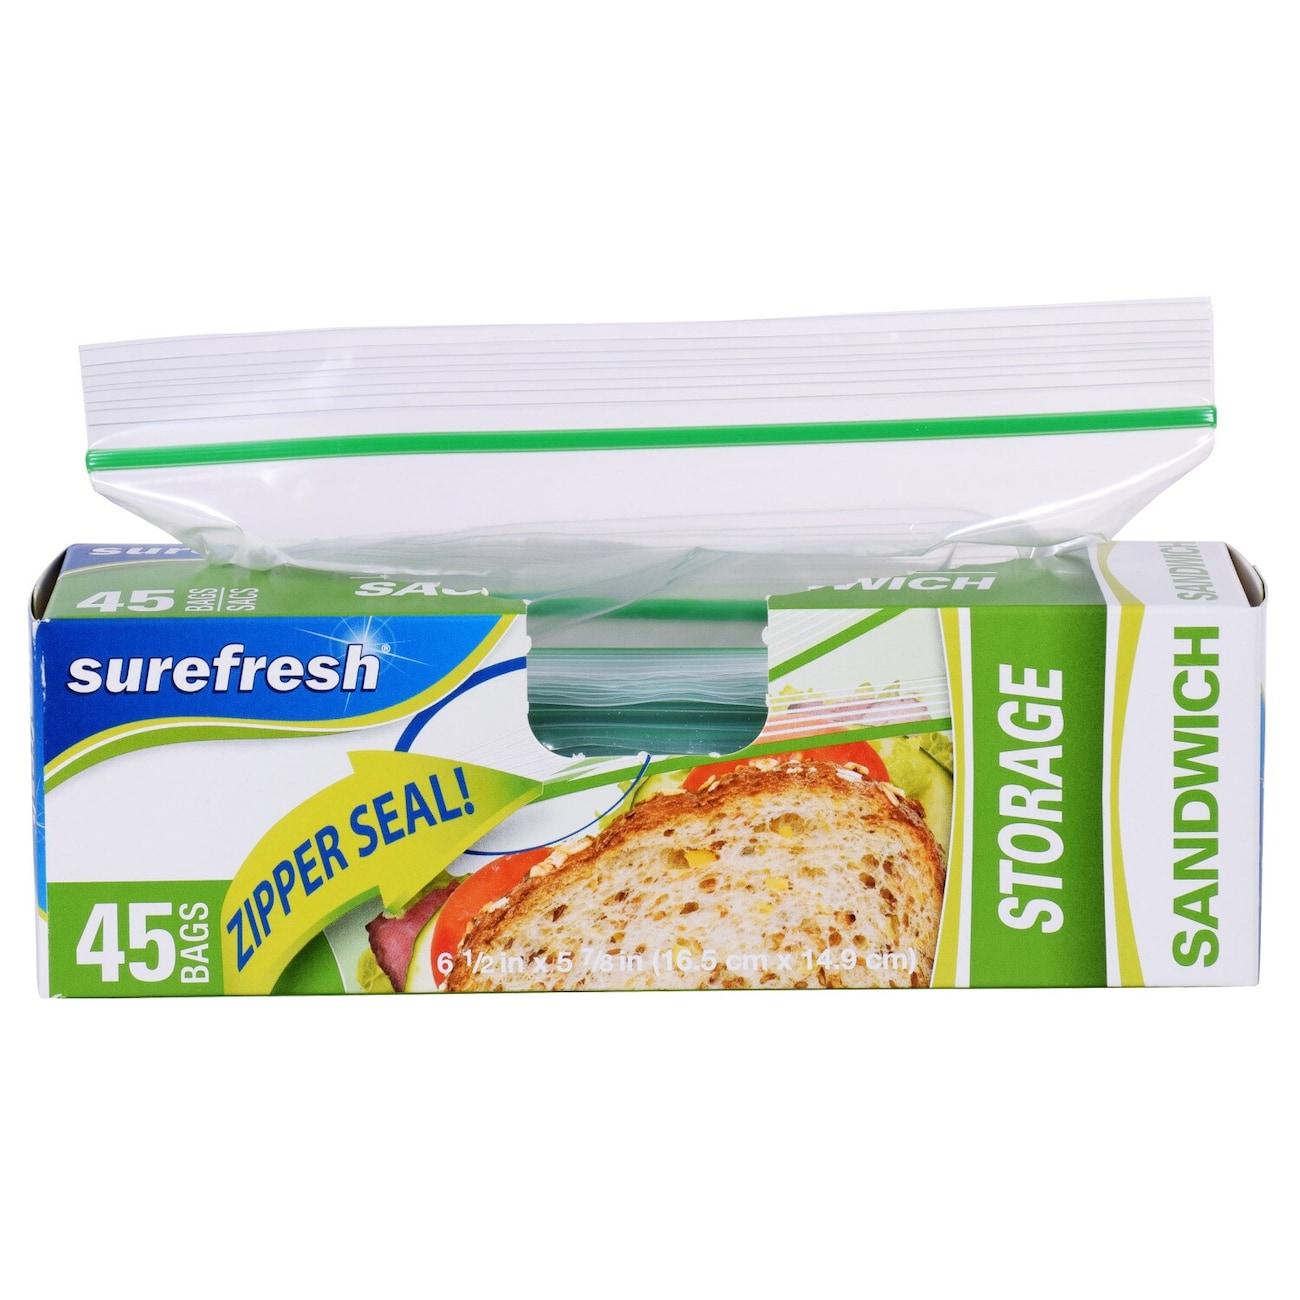 Ziploc bags dollar tree inc sure fresh zipper sandwich bags 50 ct boxes reheart Images